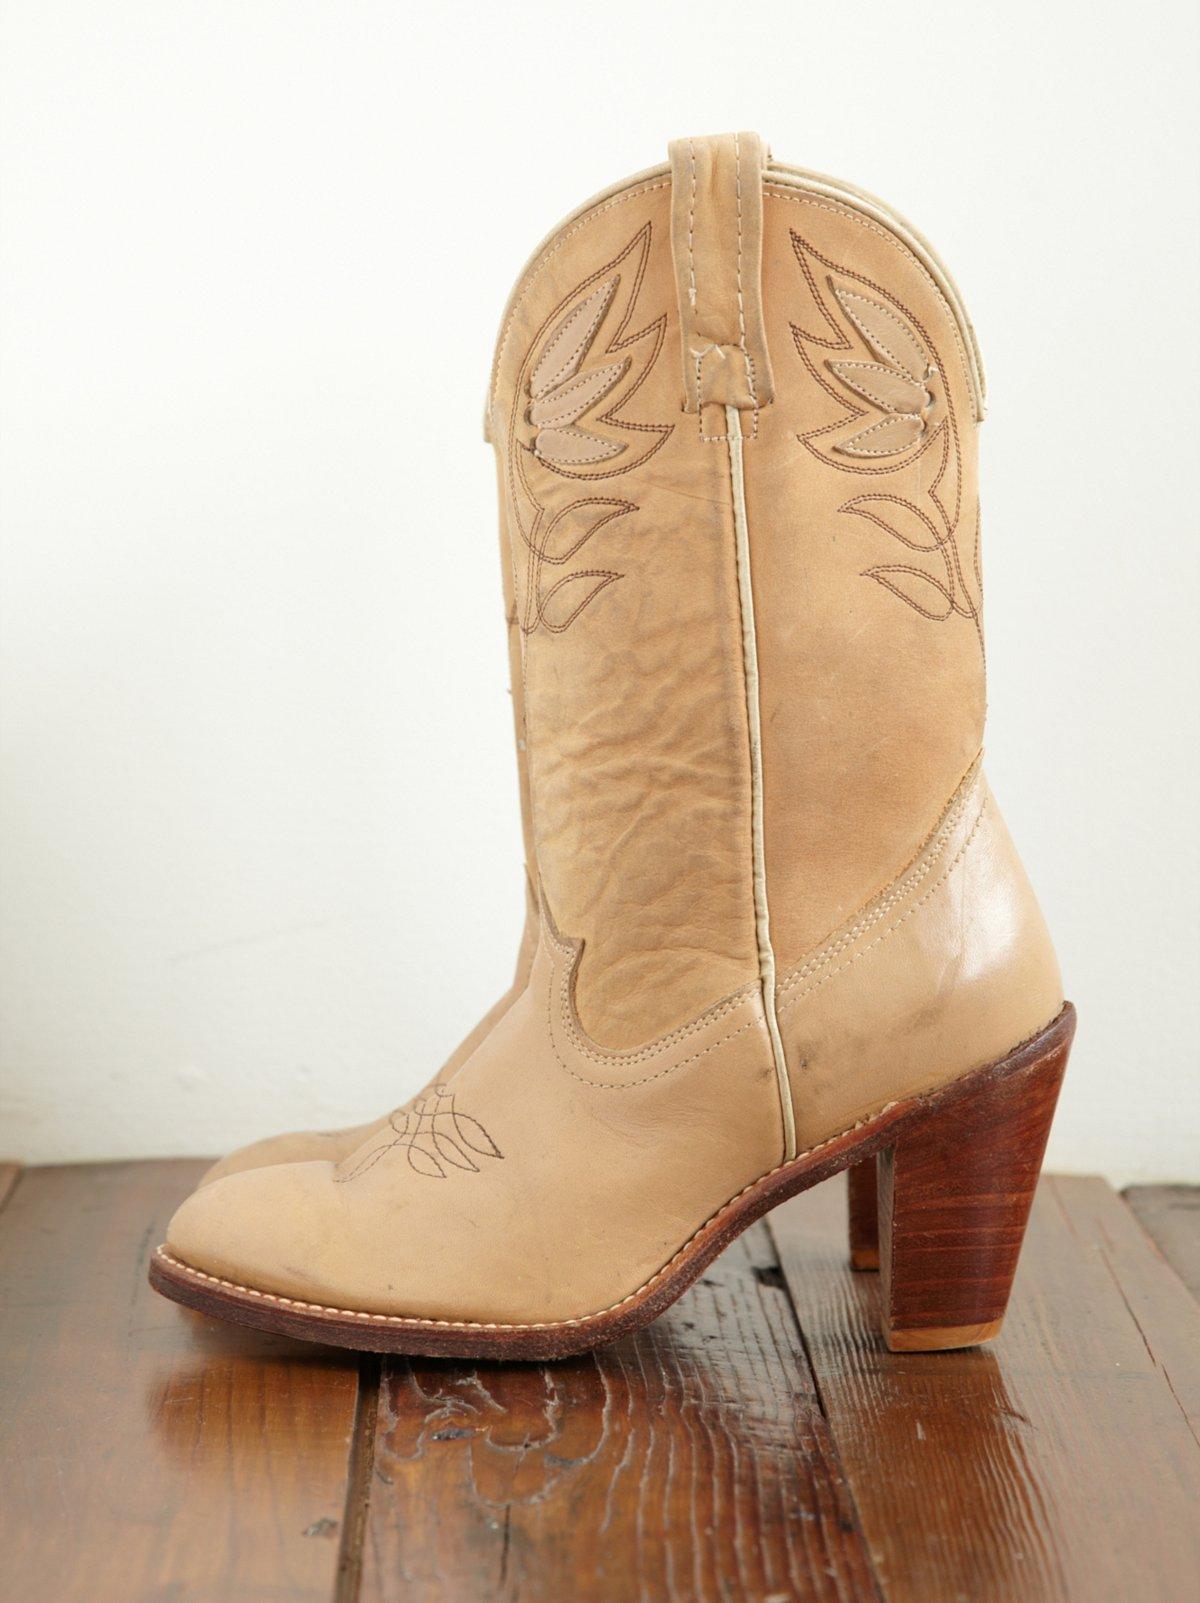 Vintage Tan Cowboy Boots